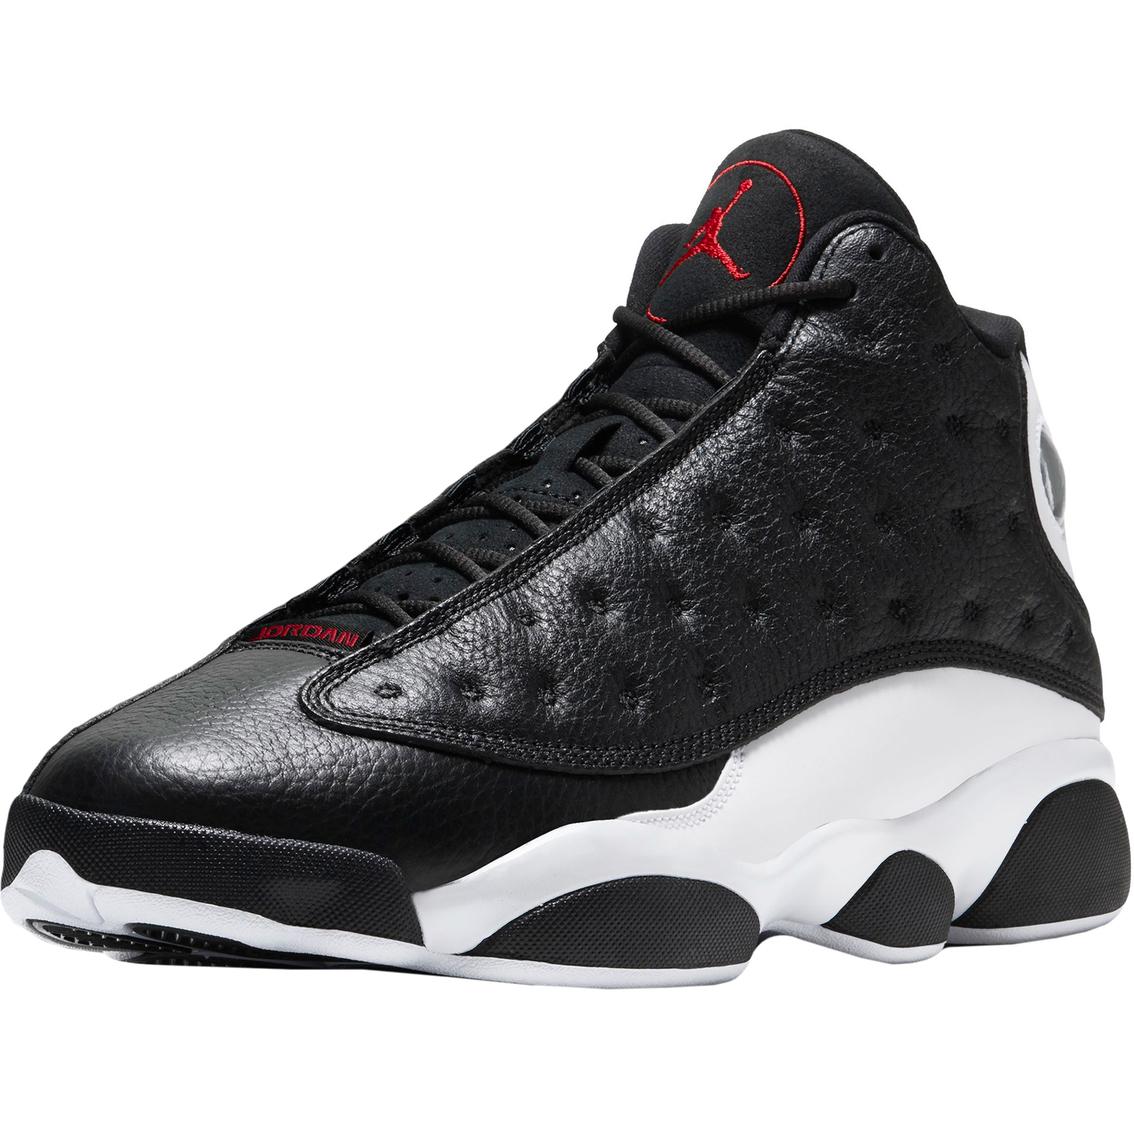 Jordan Air Jordan 13 Retro Shoes   Basketball   Back To School ...